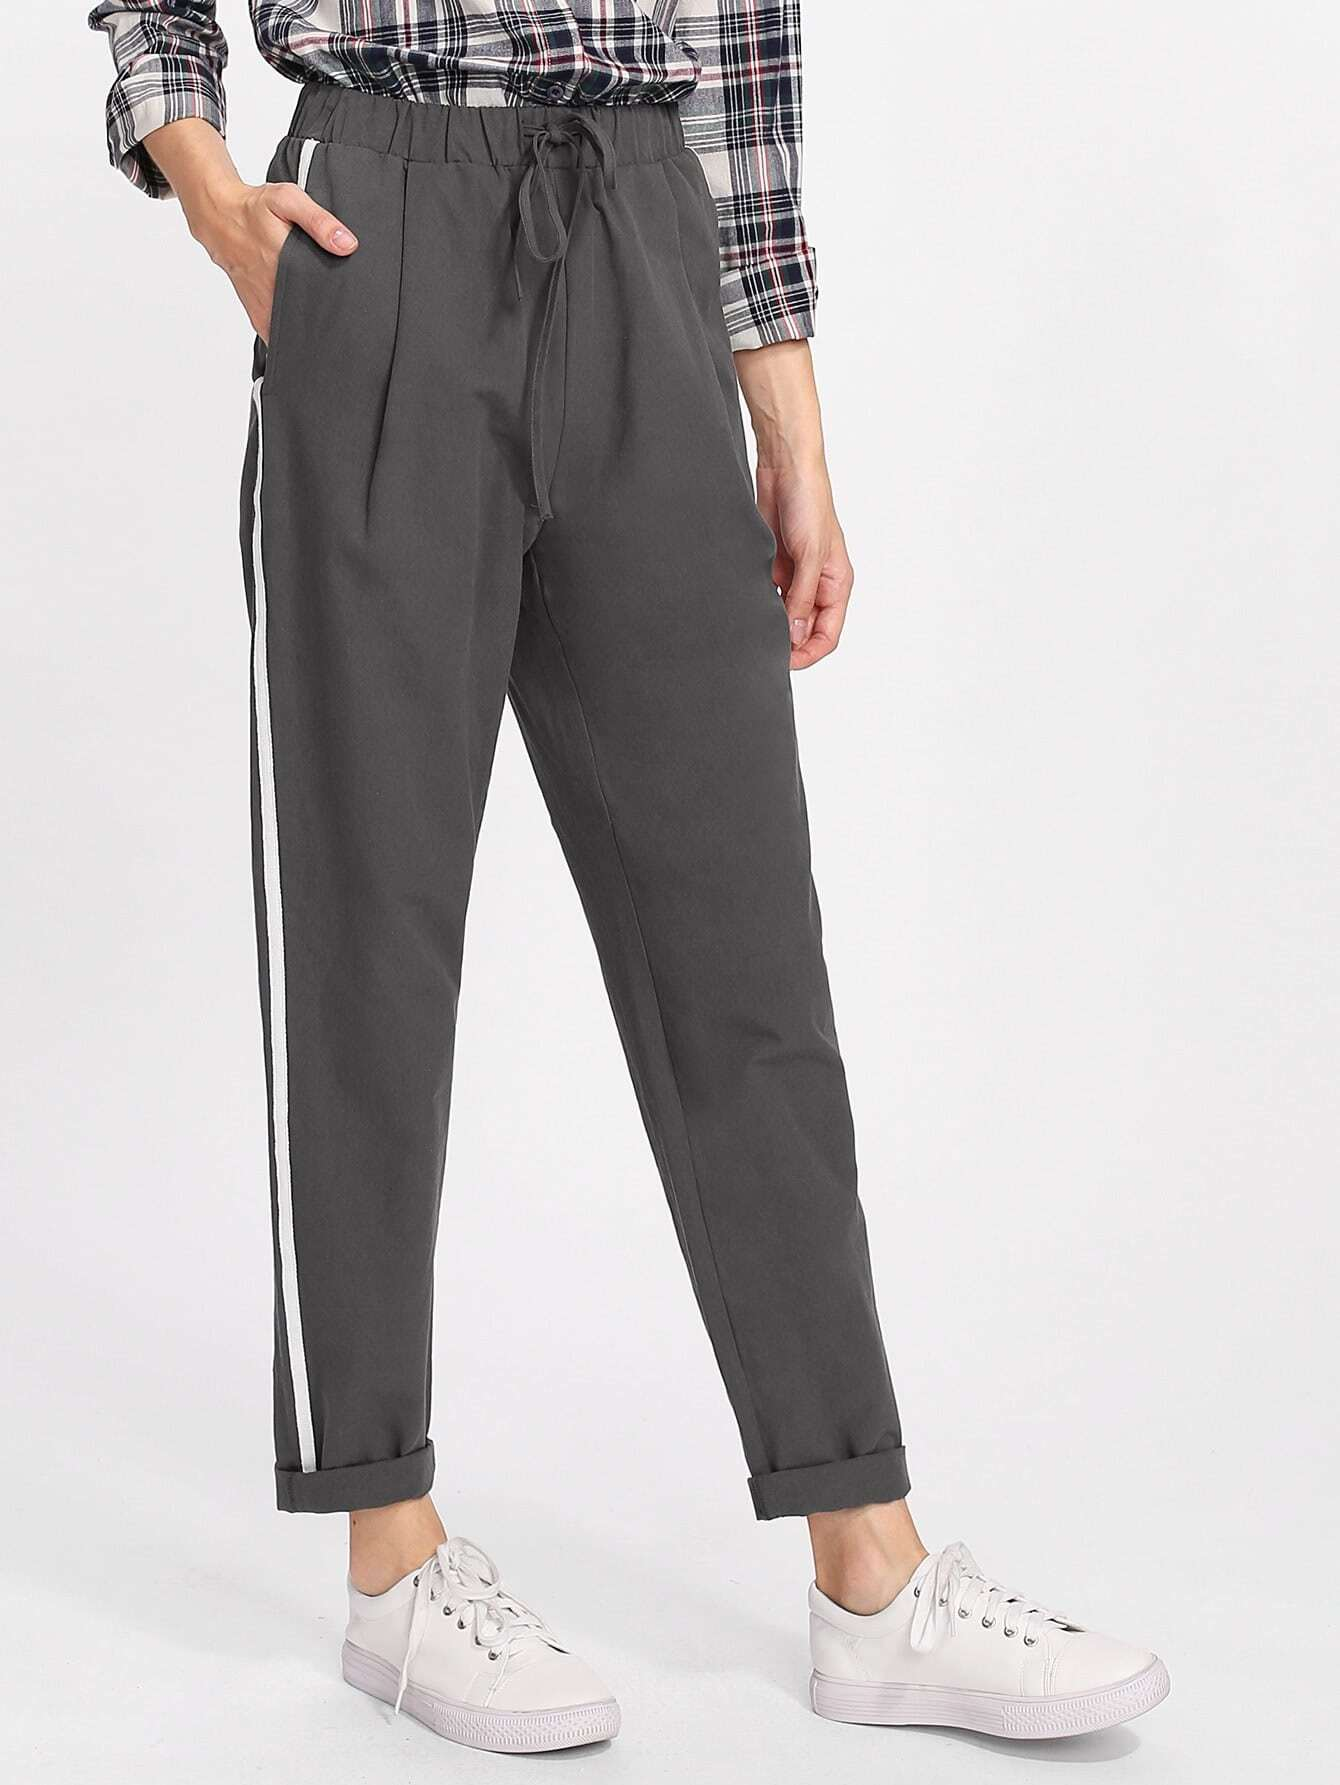 Drawstring Waist Striped Side Peg Pants drawstring waist high low striped kimono